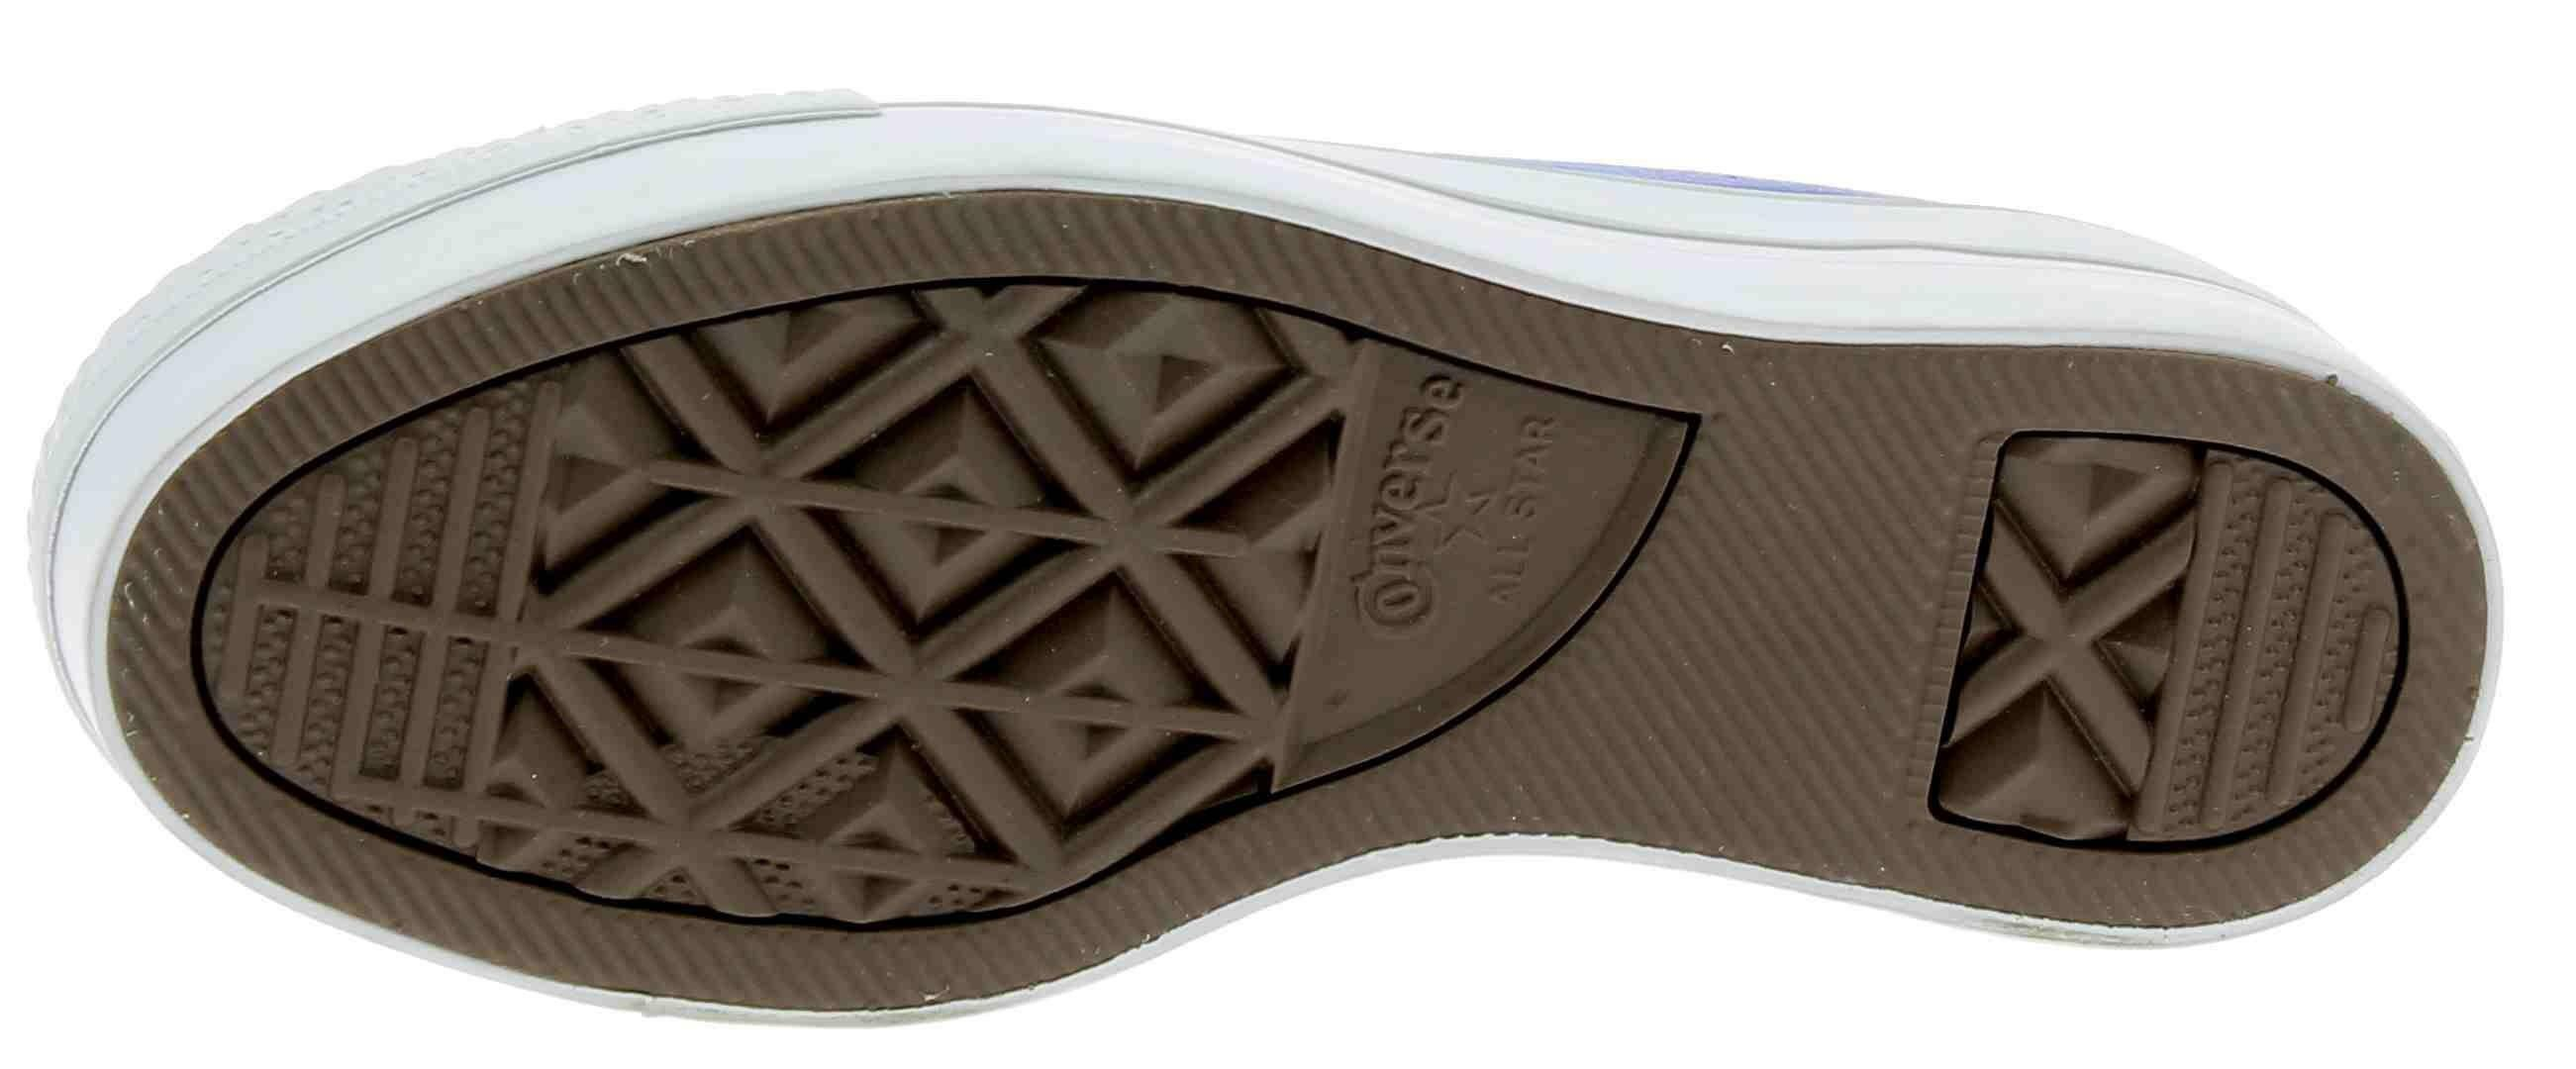 Converse Scarpe Platform Ox Scarpe Converse Donna Blu Elettrico | eBay 9c81f9